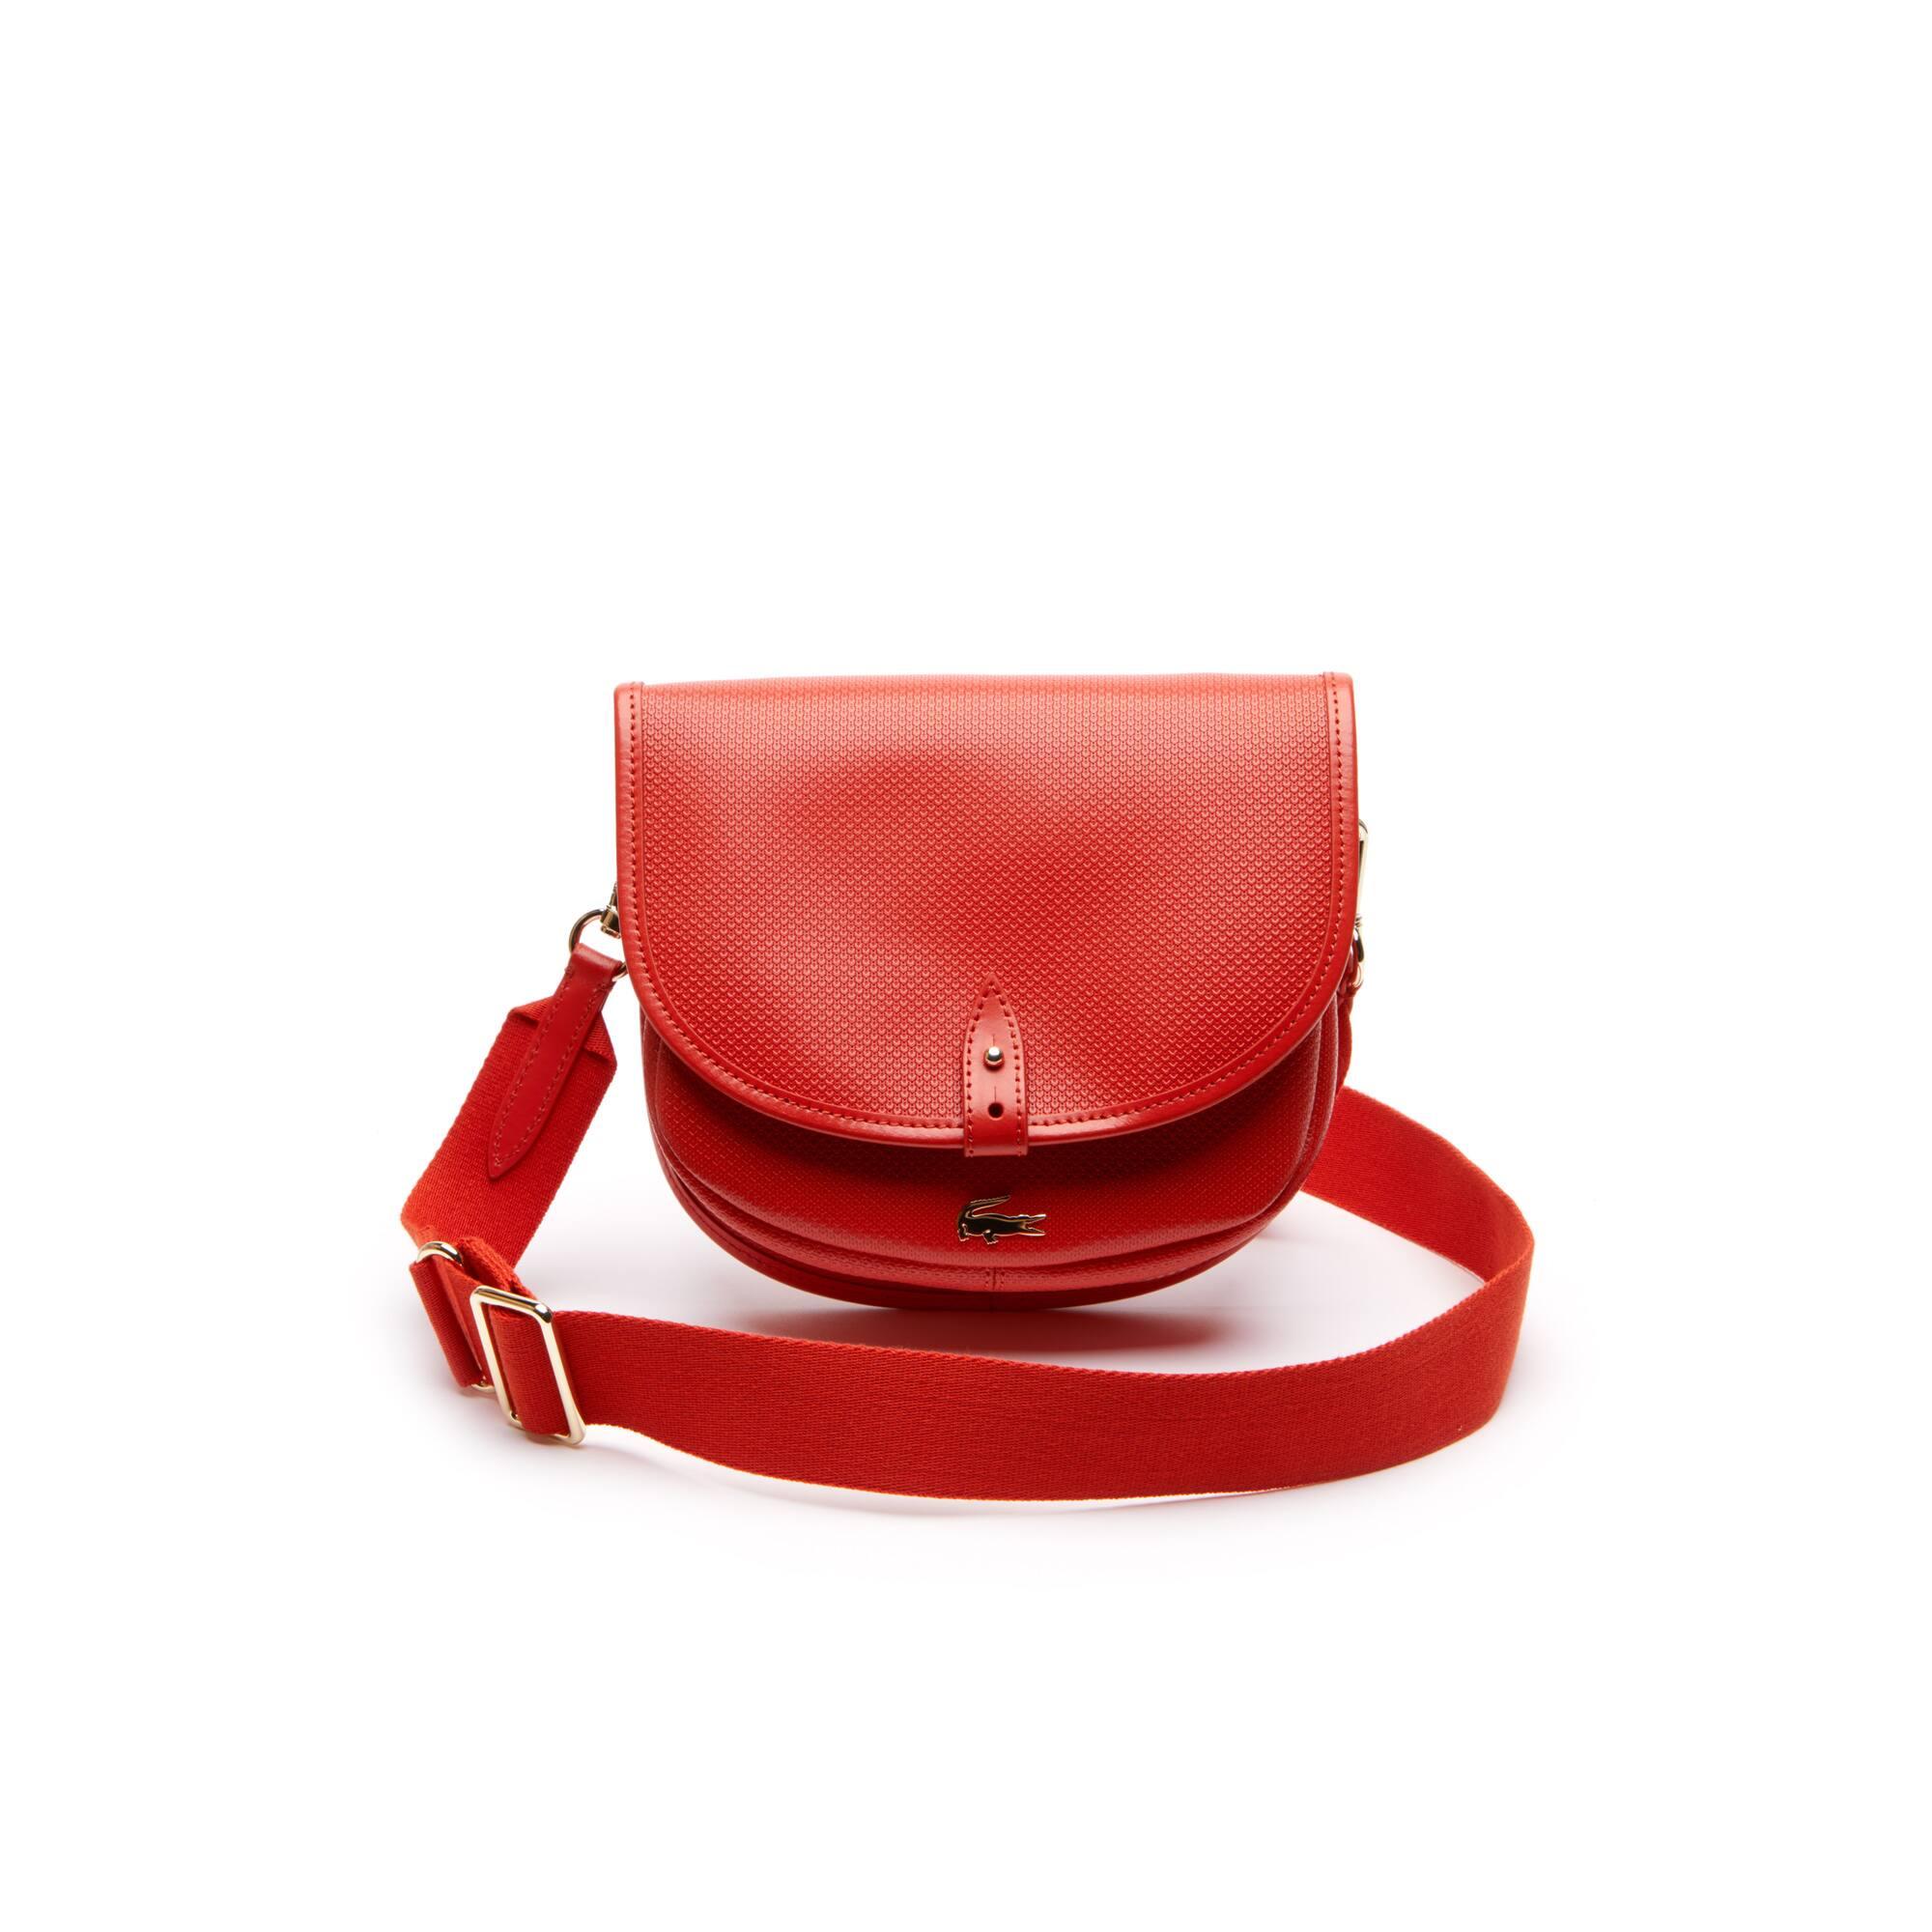 e94b00ac121 Women's Chantaco Piqué Leather Flap Crossover Bag. Colour : ORANGE.COM